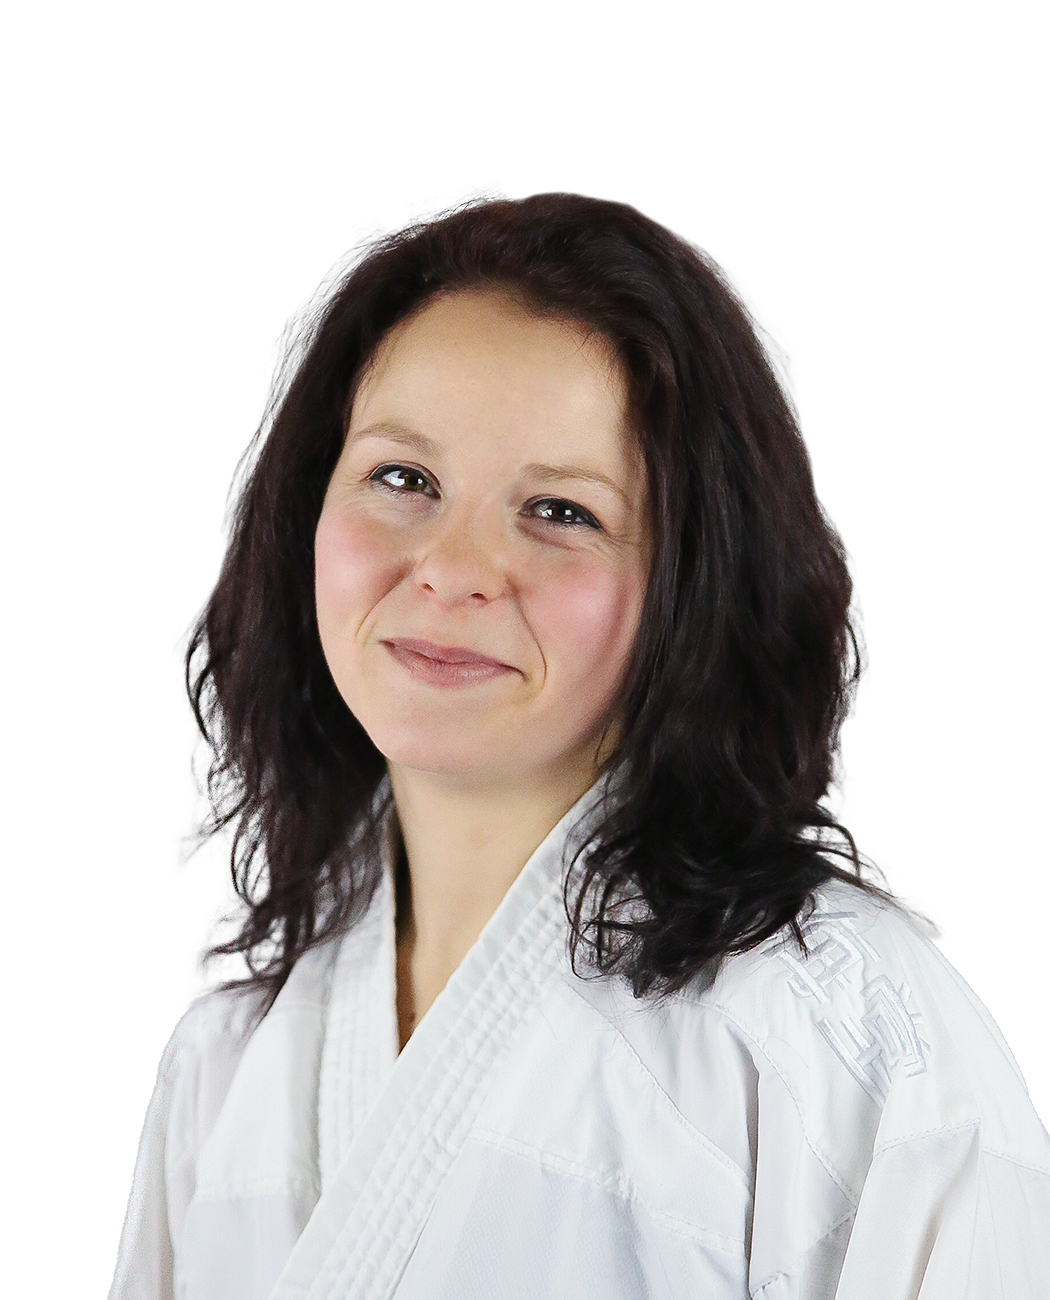 Karate_Trainer_Christin-Rochau_Portrait